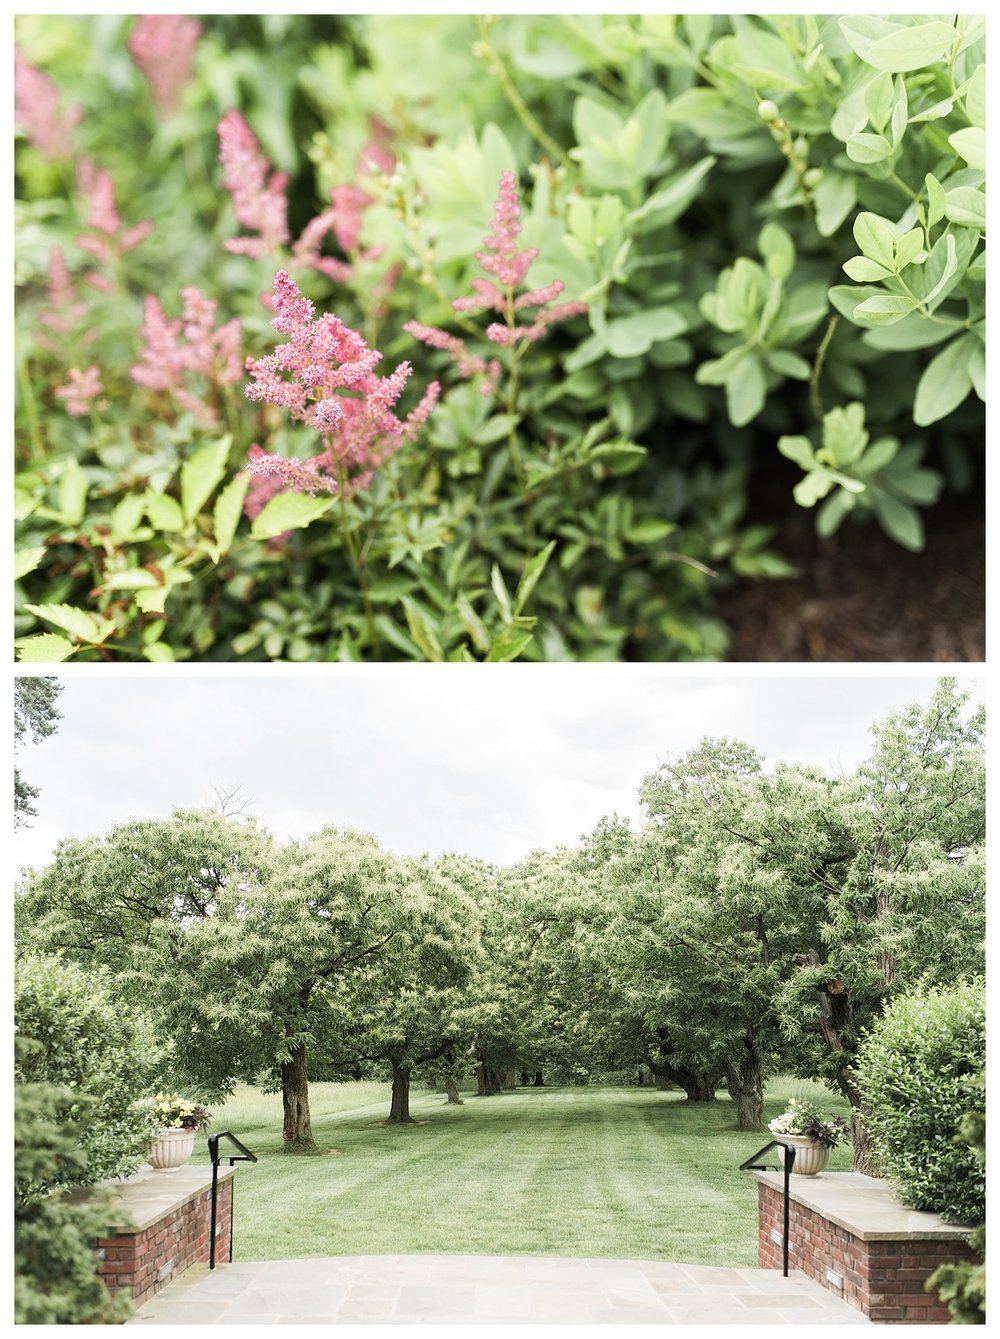 pinecroft-crosley-estate-everleigh-photography-cincinnati-wedding-photographer-20